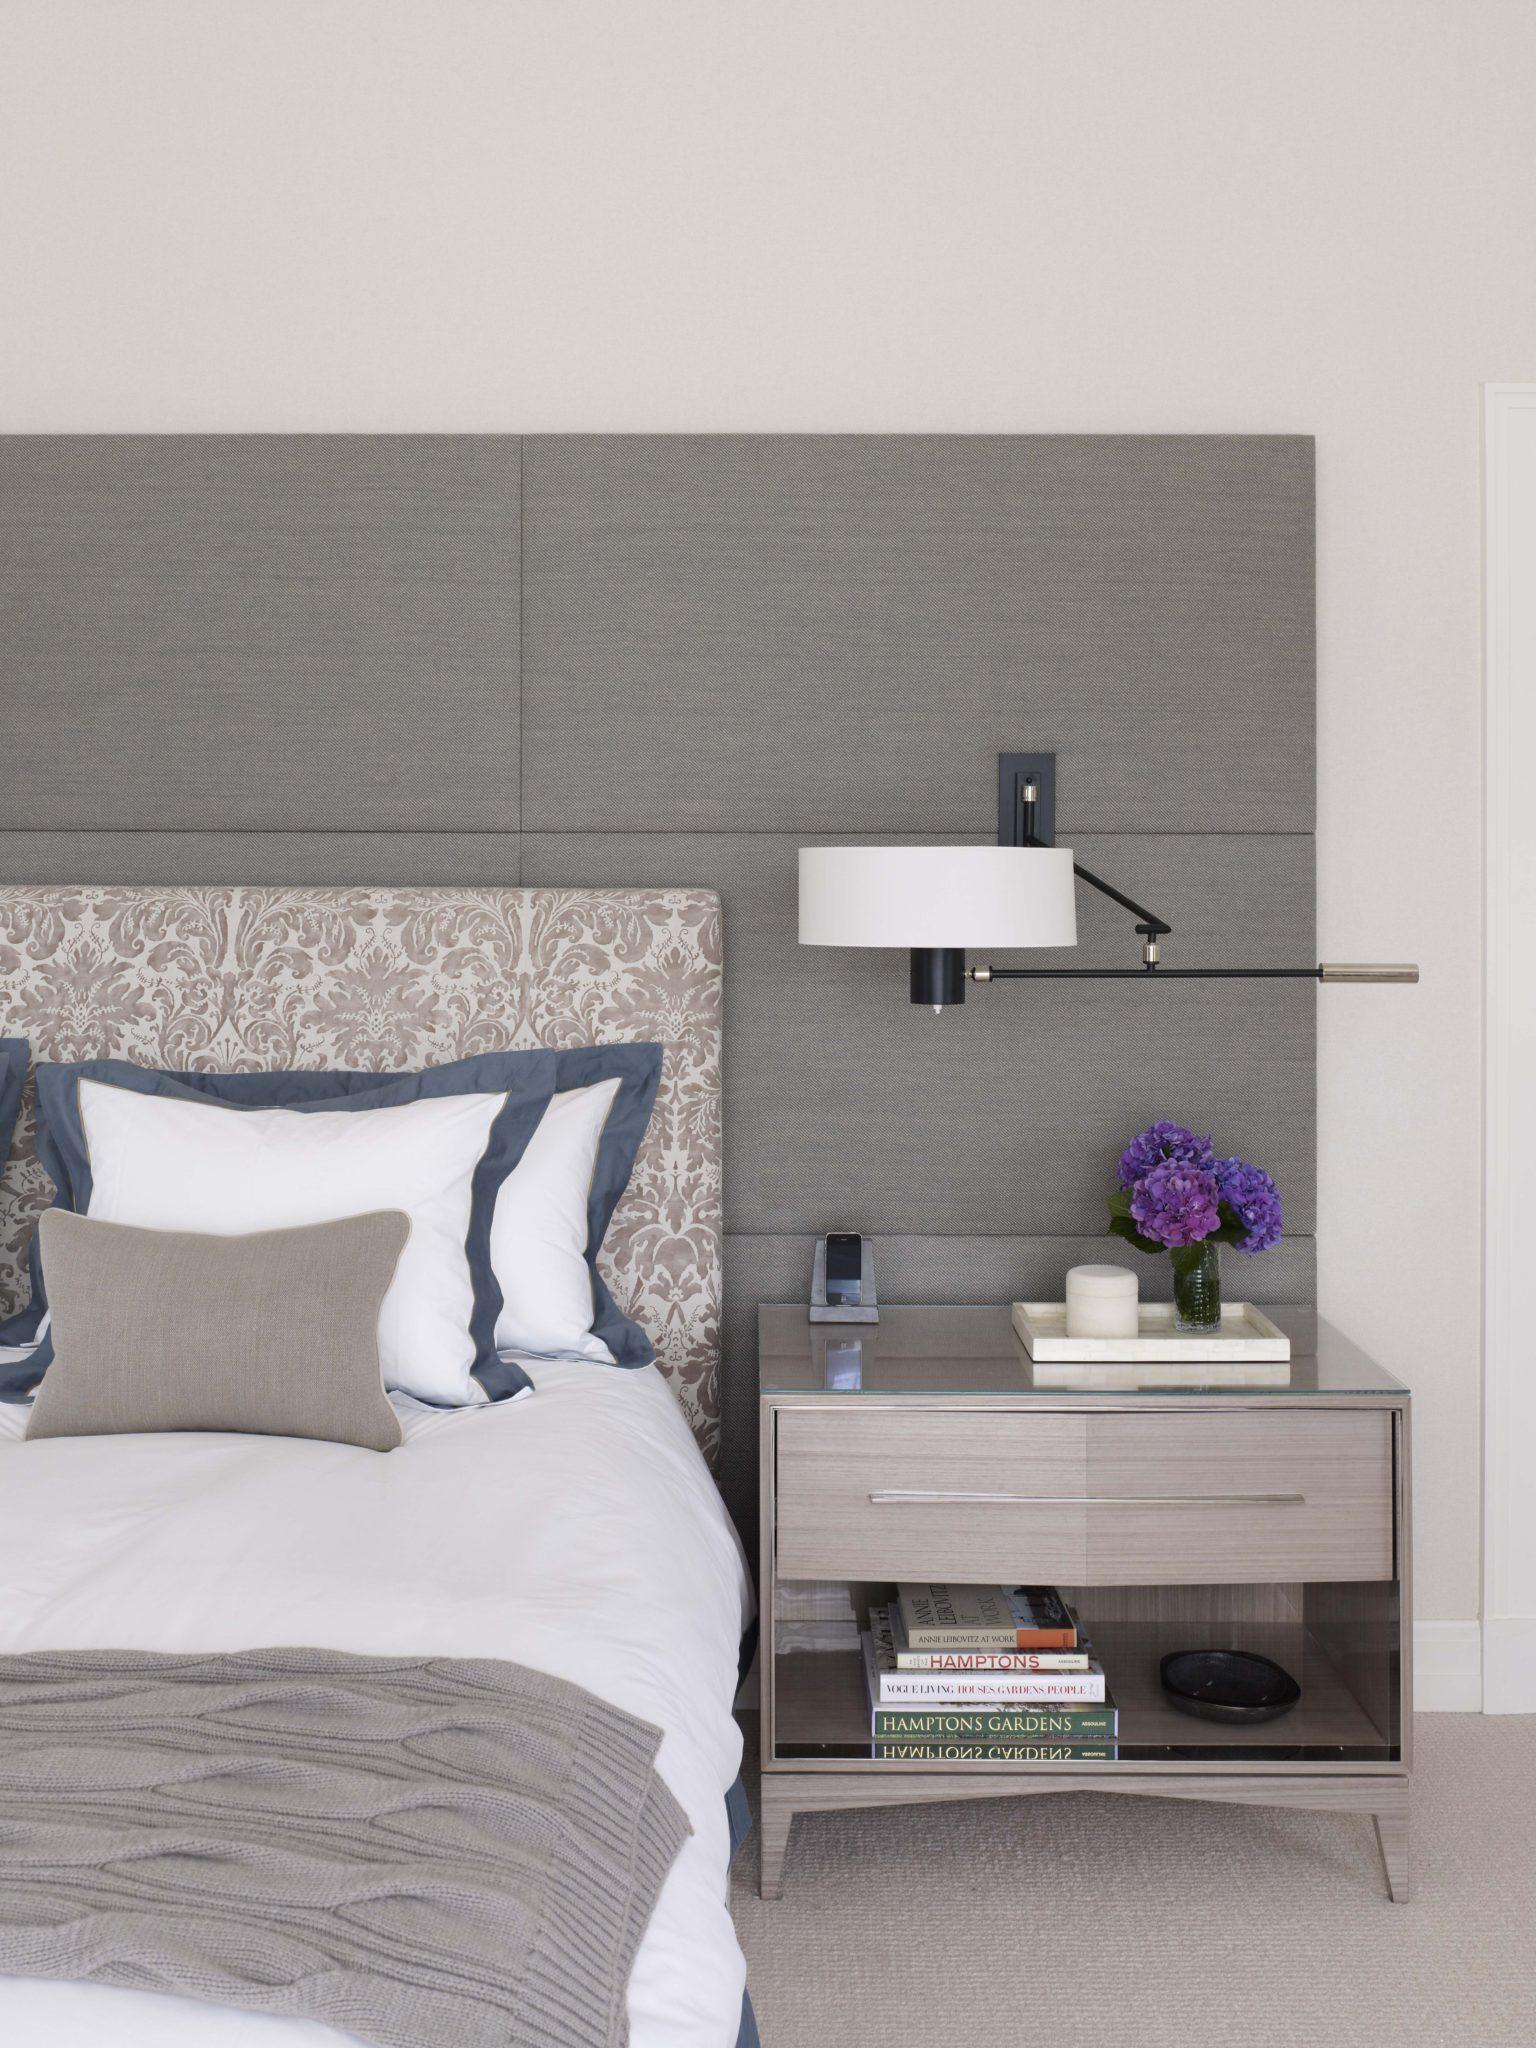 Bridgehampton Residence, Master Bedroom bed with upholstered headboard wall by Stephens Design Group